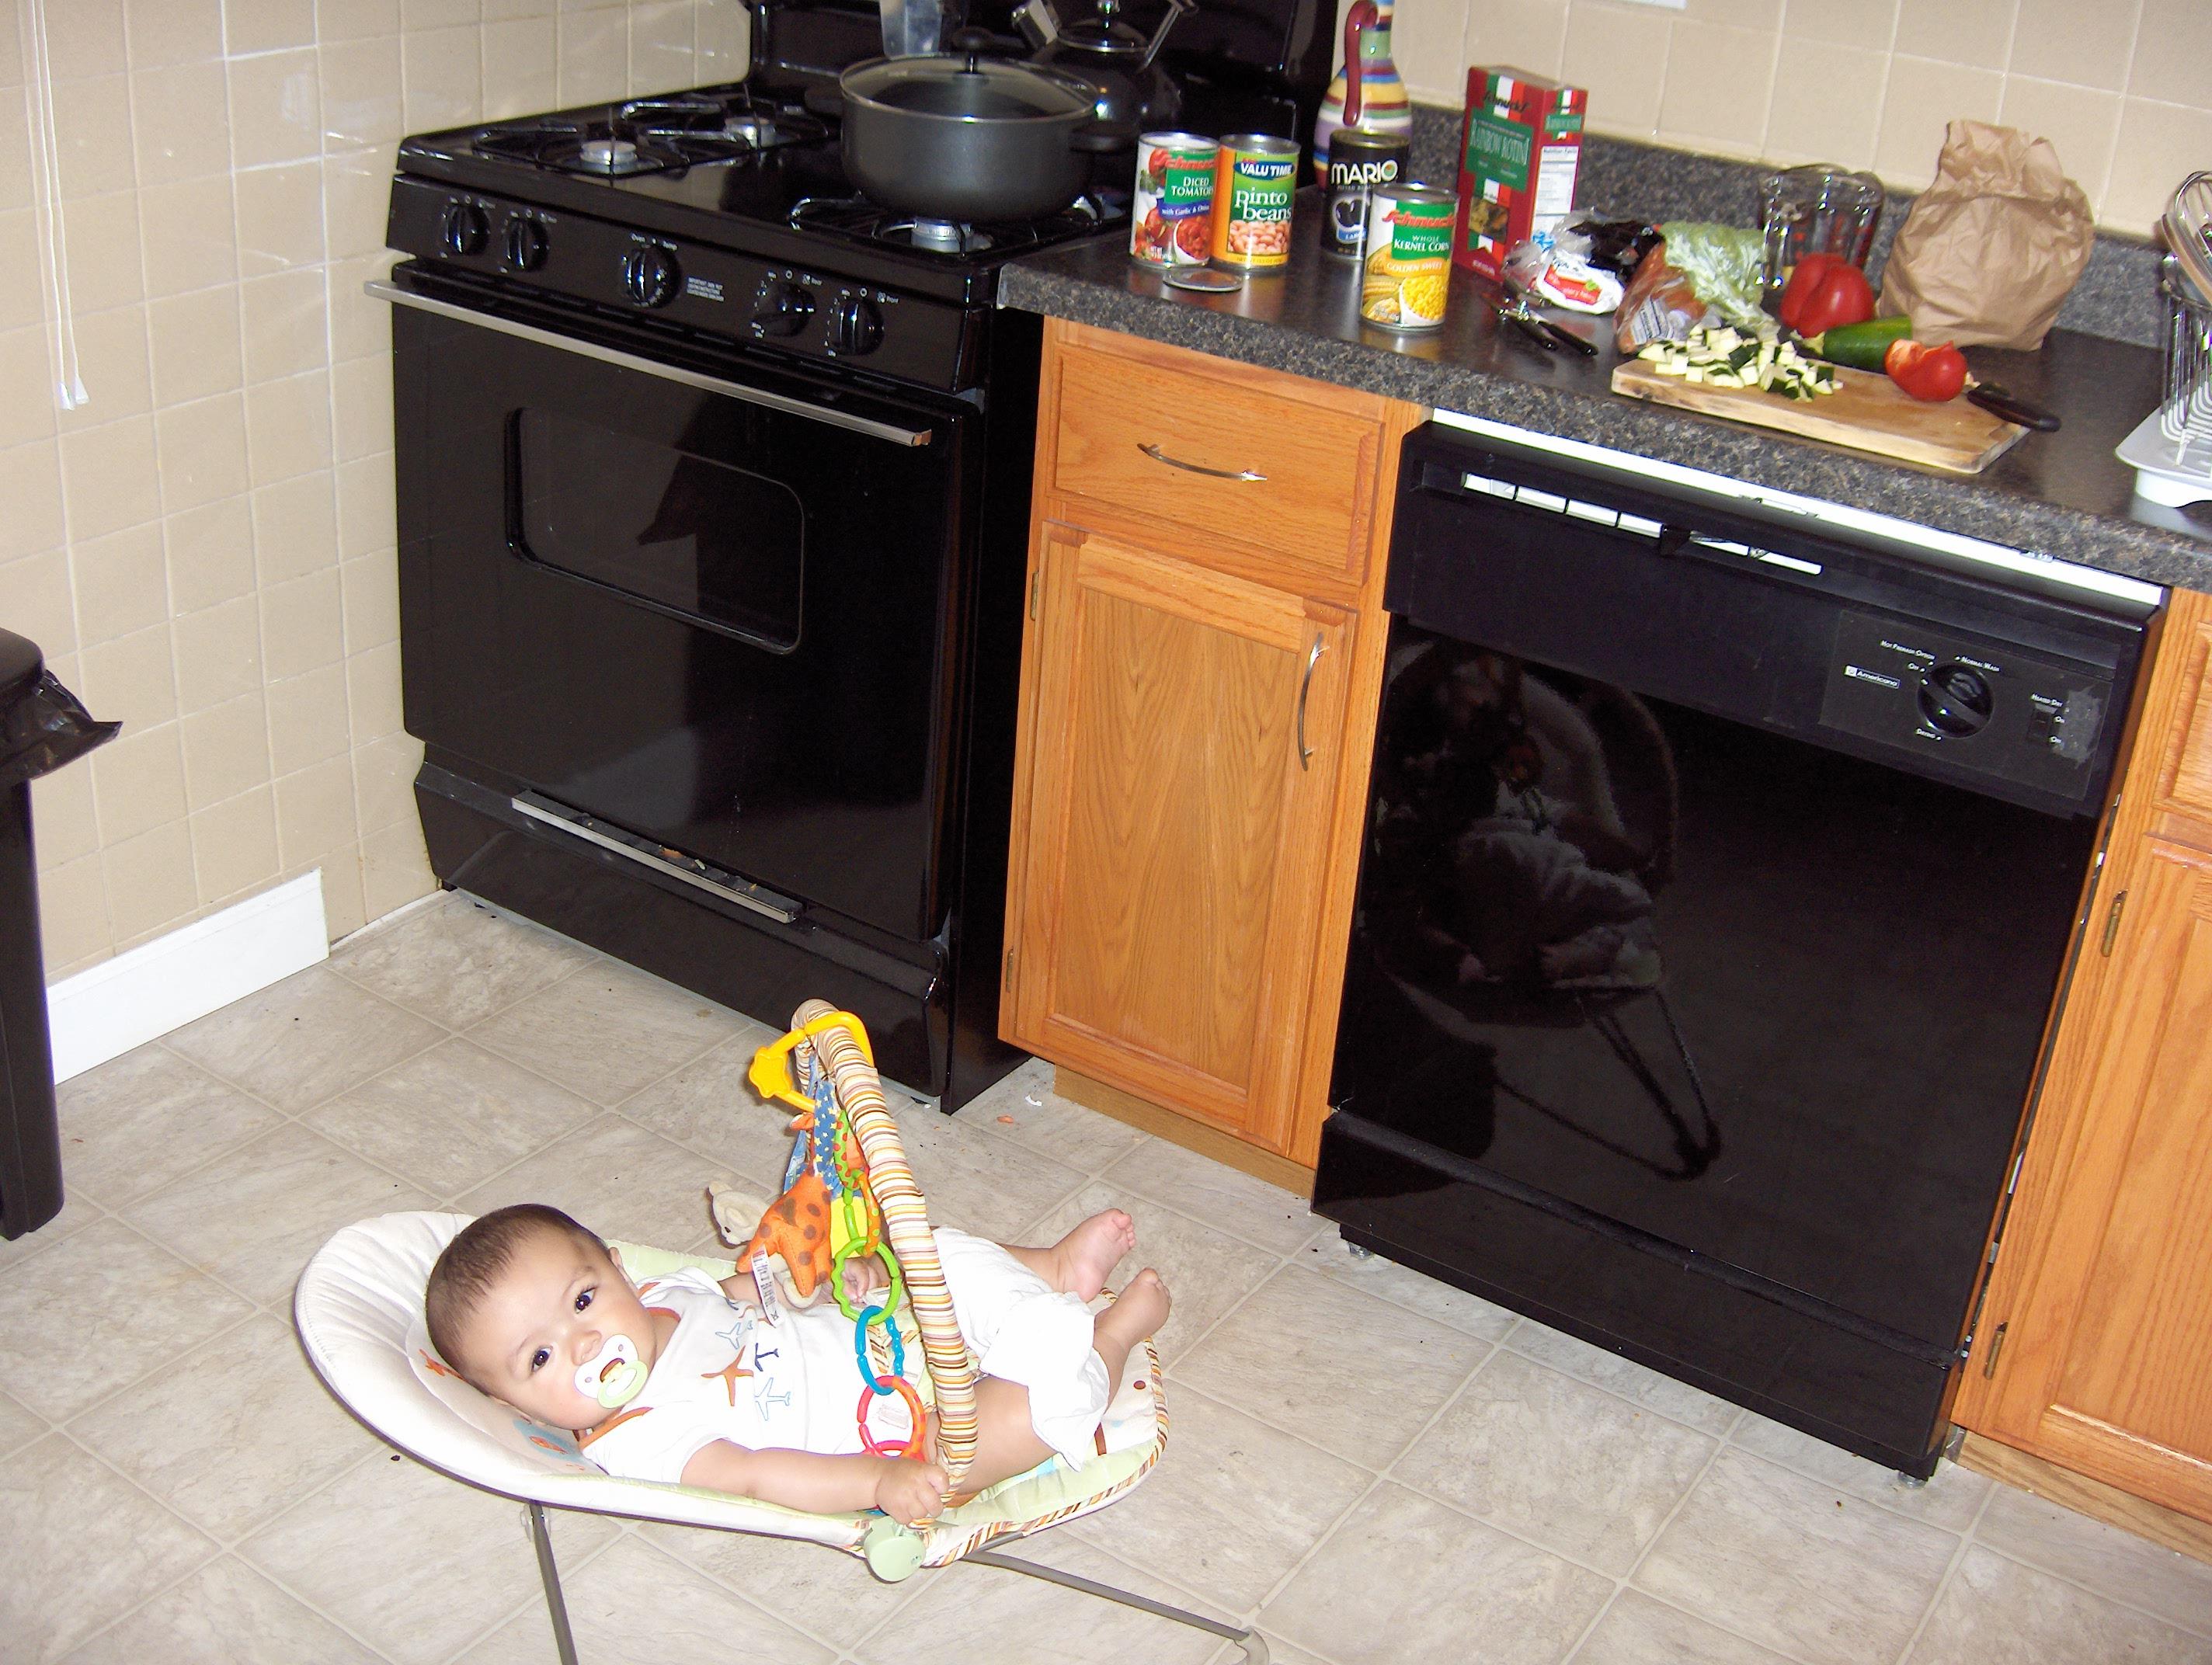 Kaz in The Kitchen